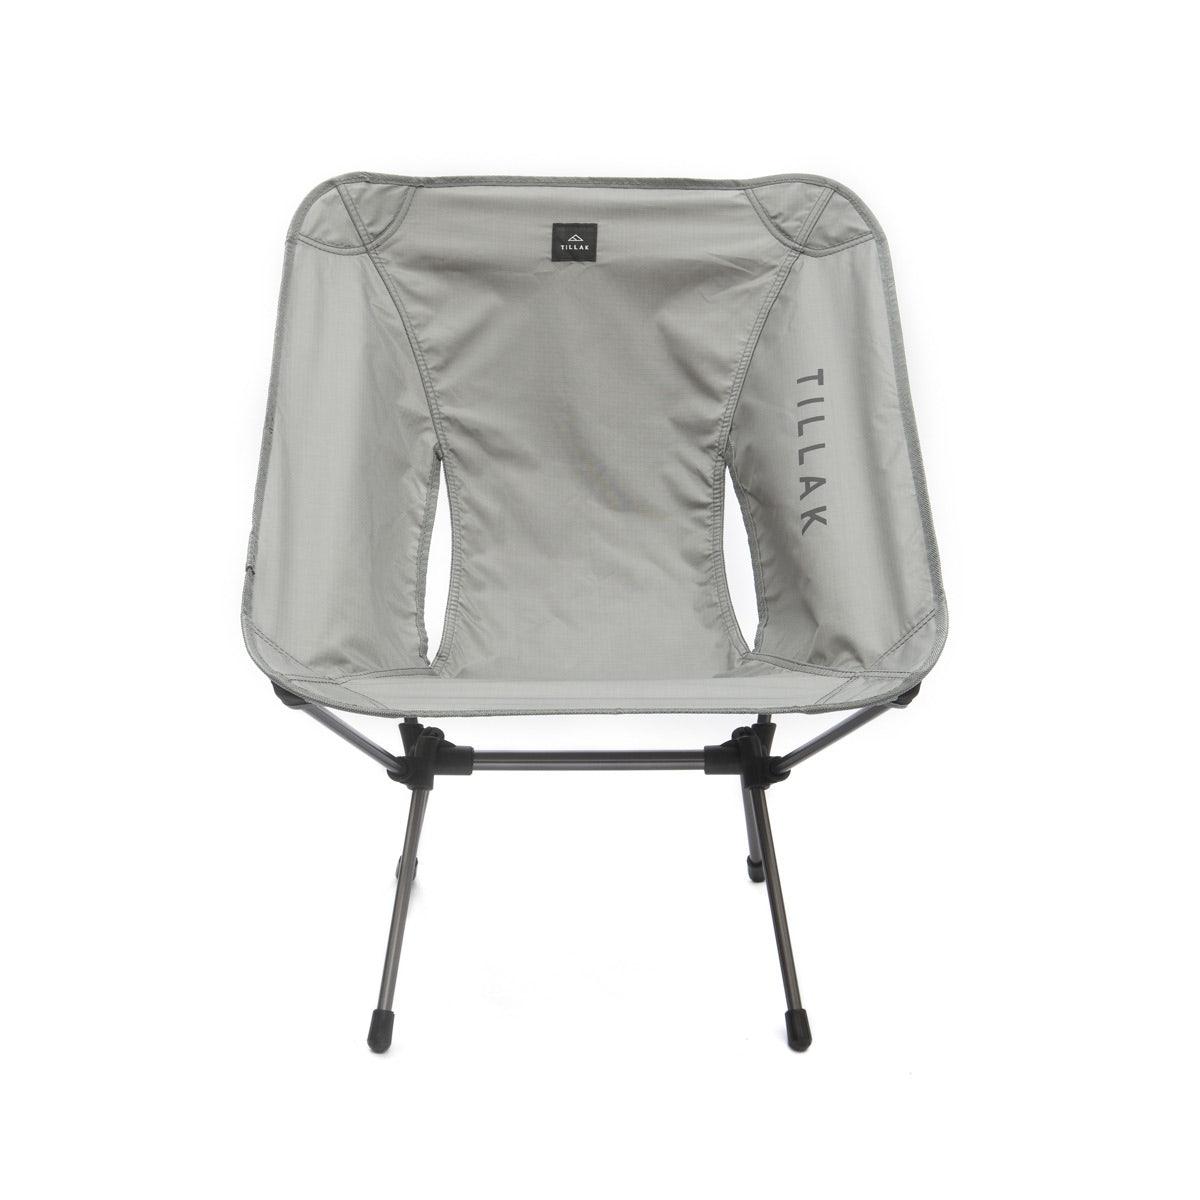 Tillak Sitka Camp Chair